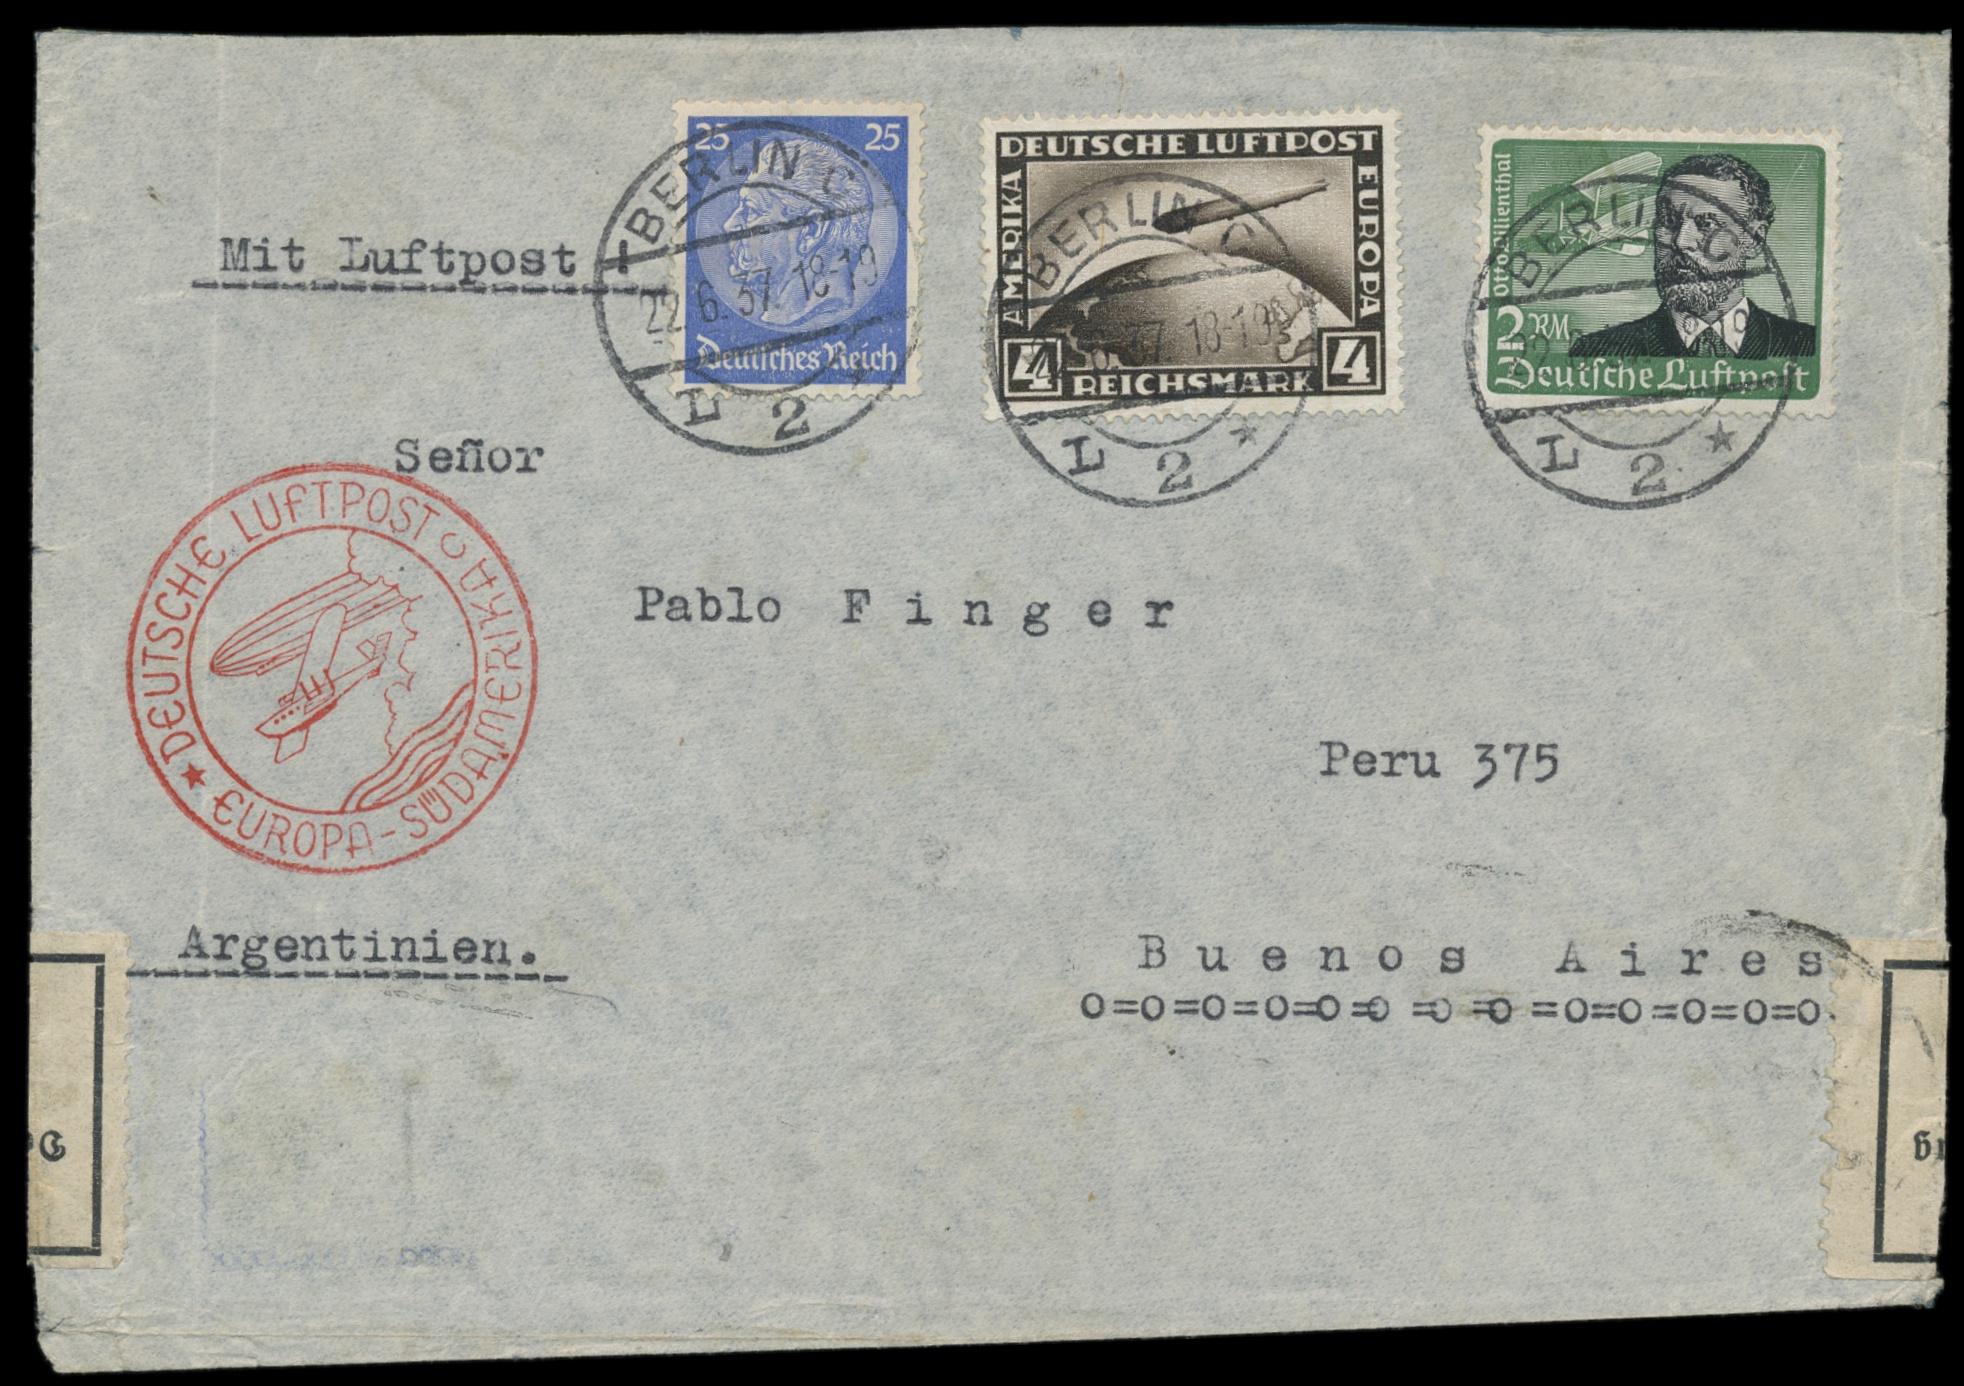 Lot 1907 - Flug- und Zeppelinpost flugpost -  Peter Harlos Auctions 42. Harlos Auktion